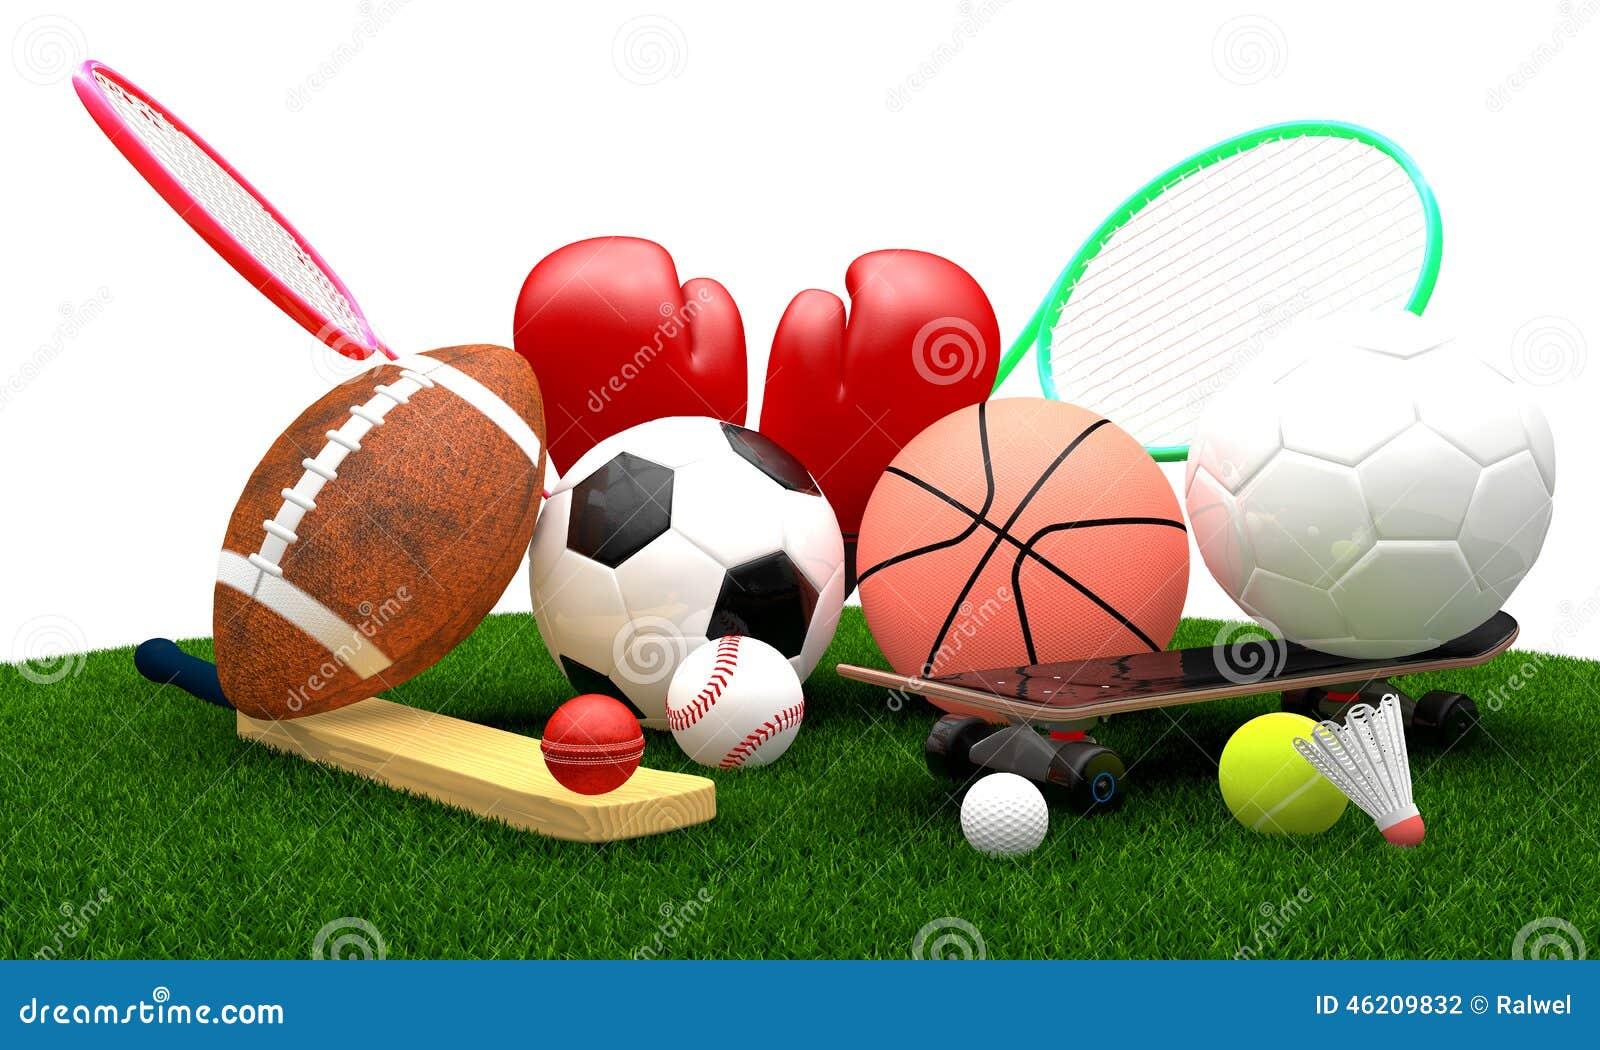 Sports Equipment Stock Illustration - Image: 46209832